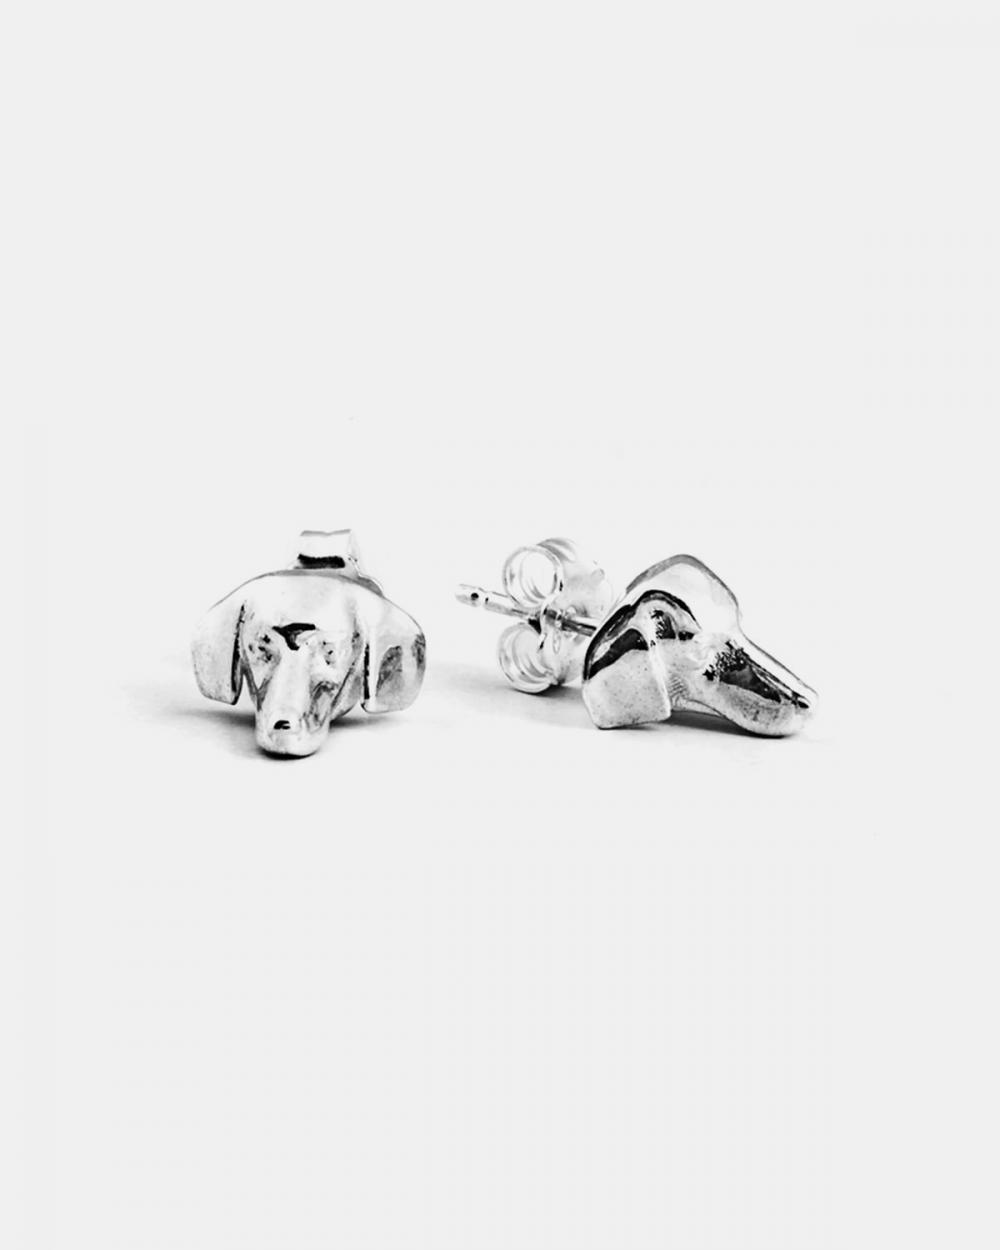 Earrings DACHSHUND COUPLE EARRINGS / POLISHED SILVER NOVE25